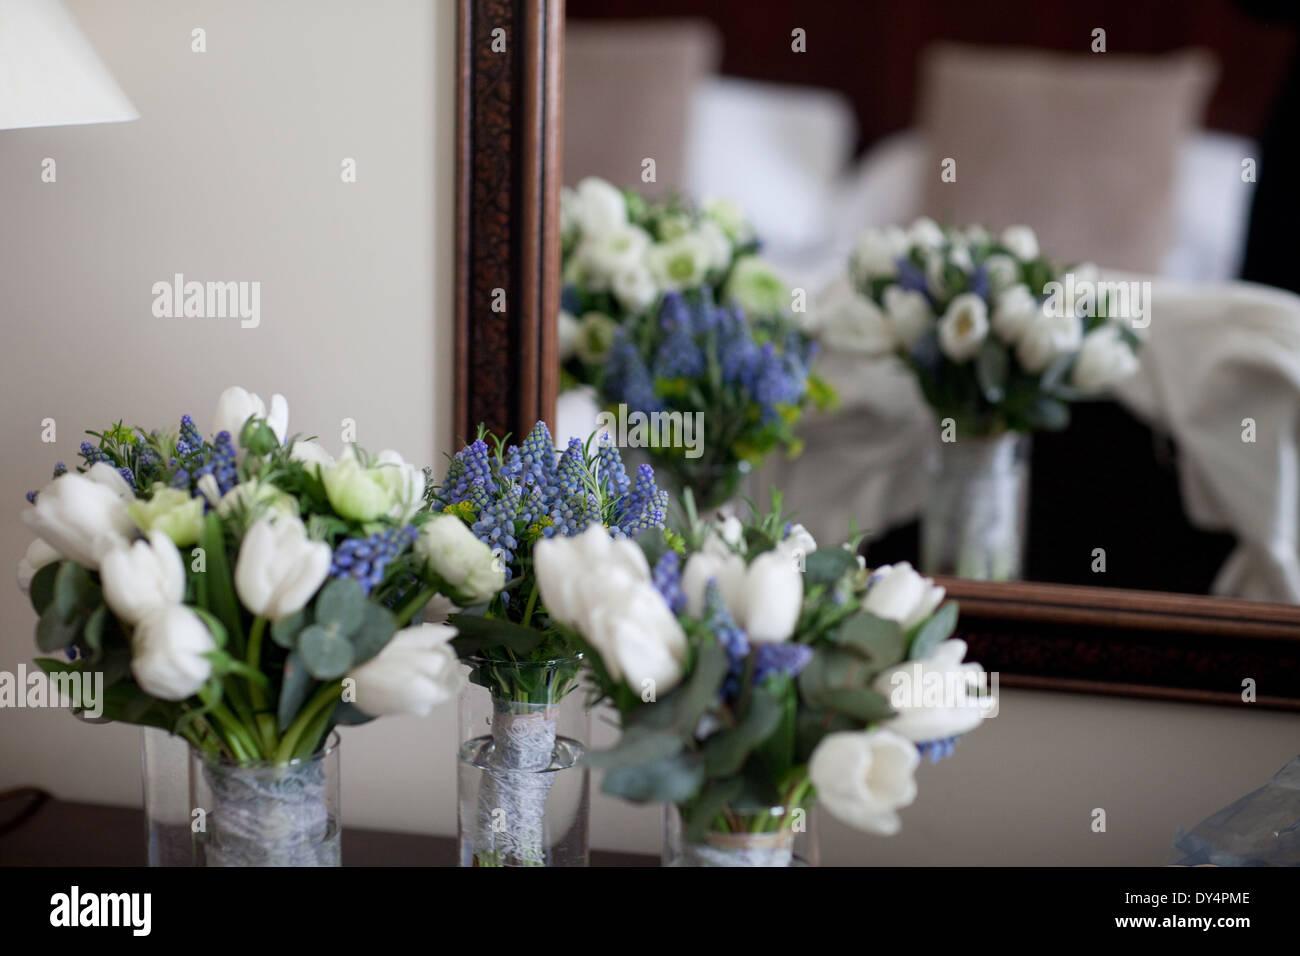 Wedding Flowers White Tulips Blue Hyacinths Stock Photo 68332446